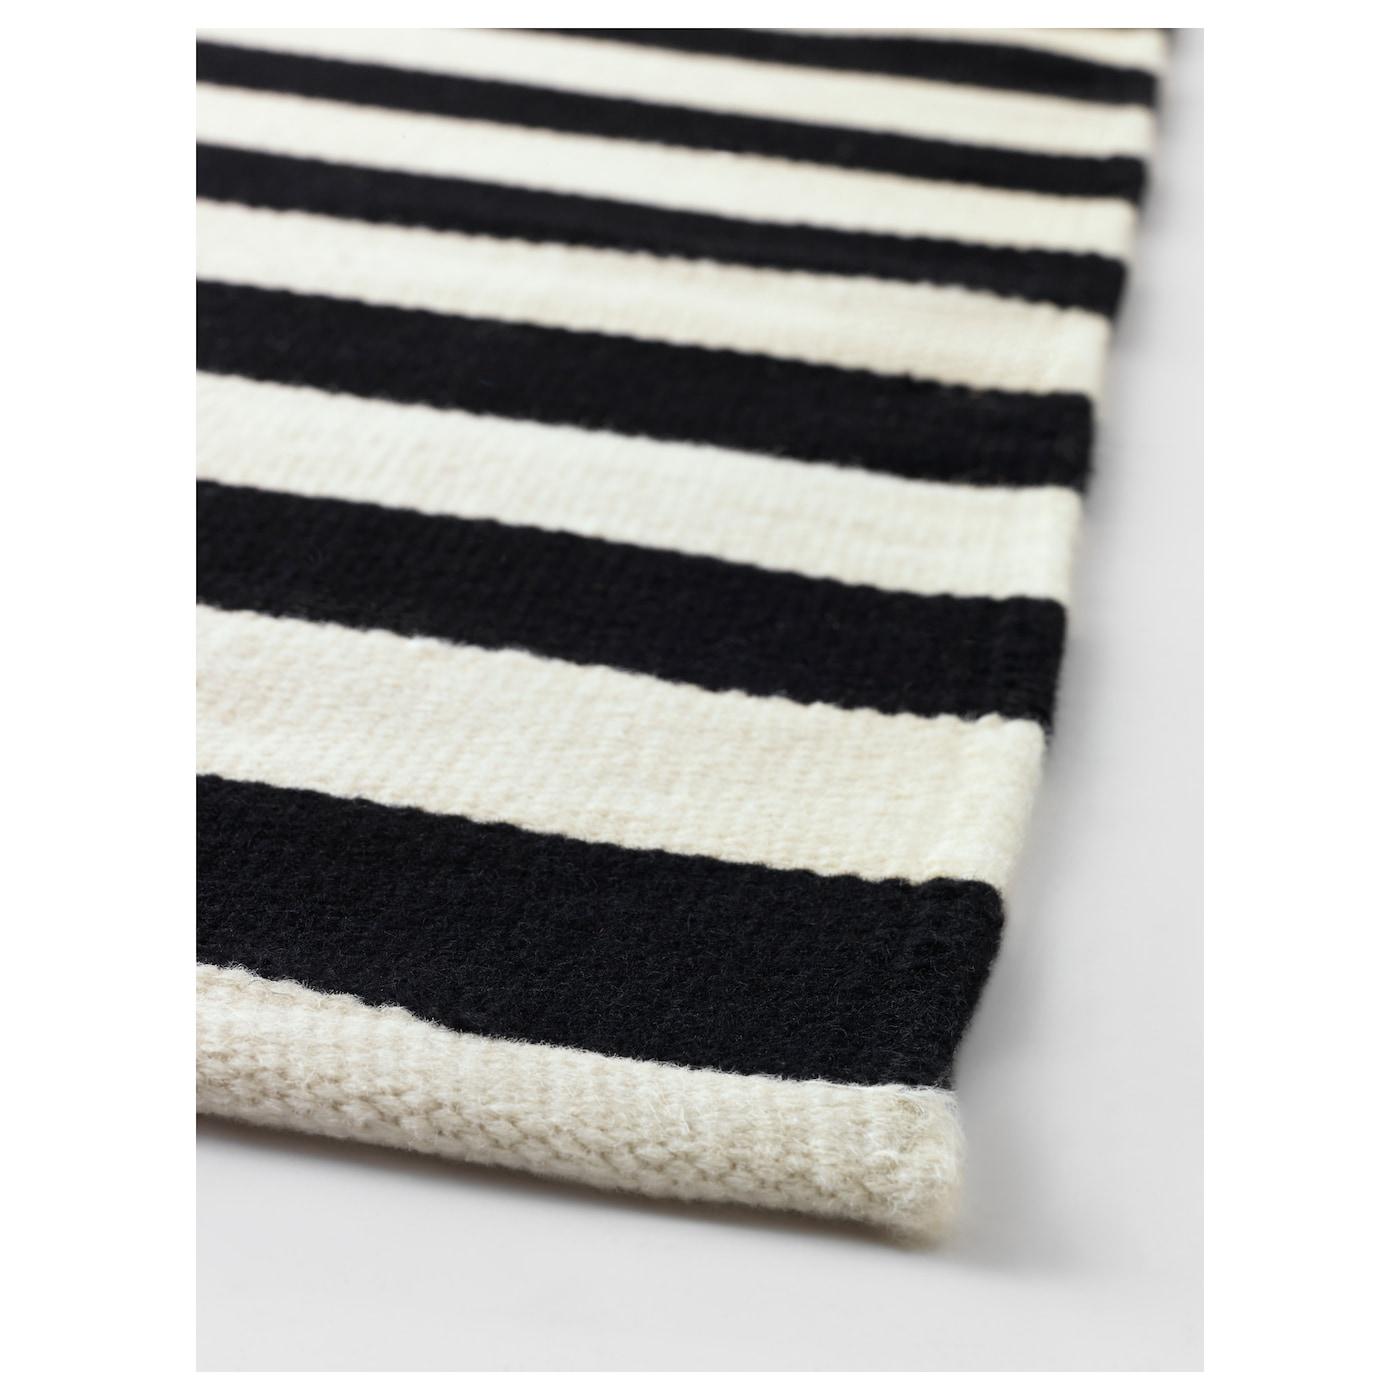 Stockholm Rug Flatwoven Handmade Striped Black Off White